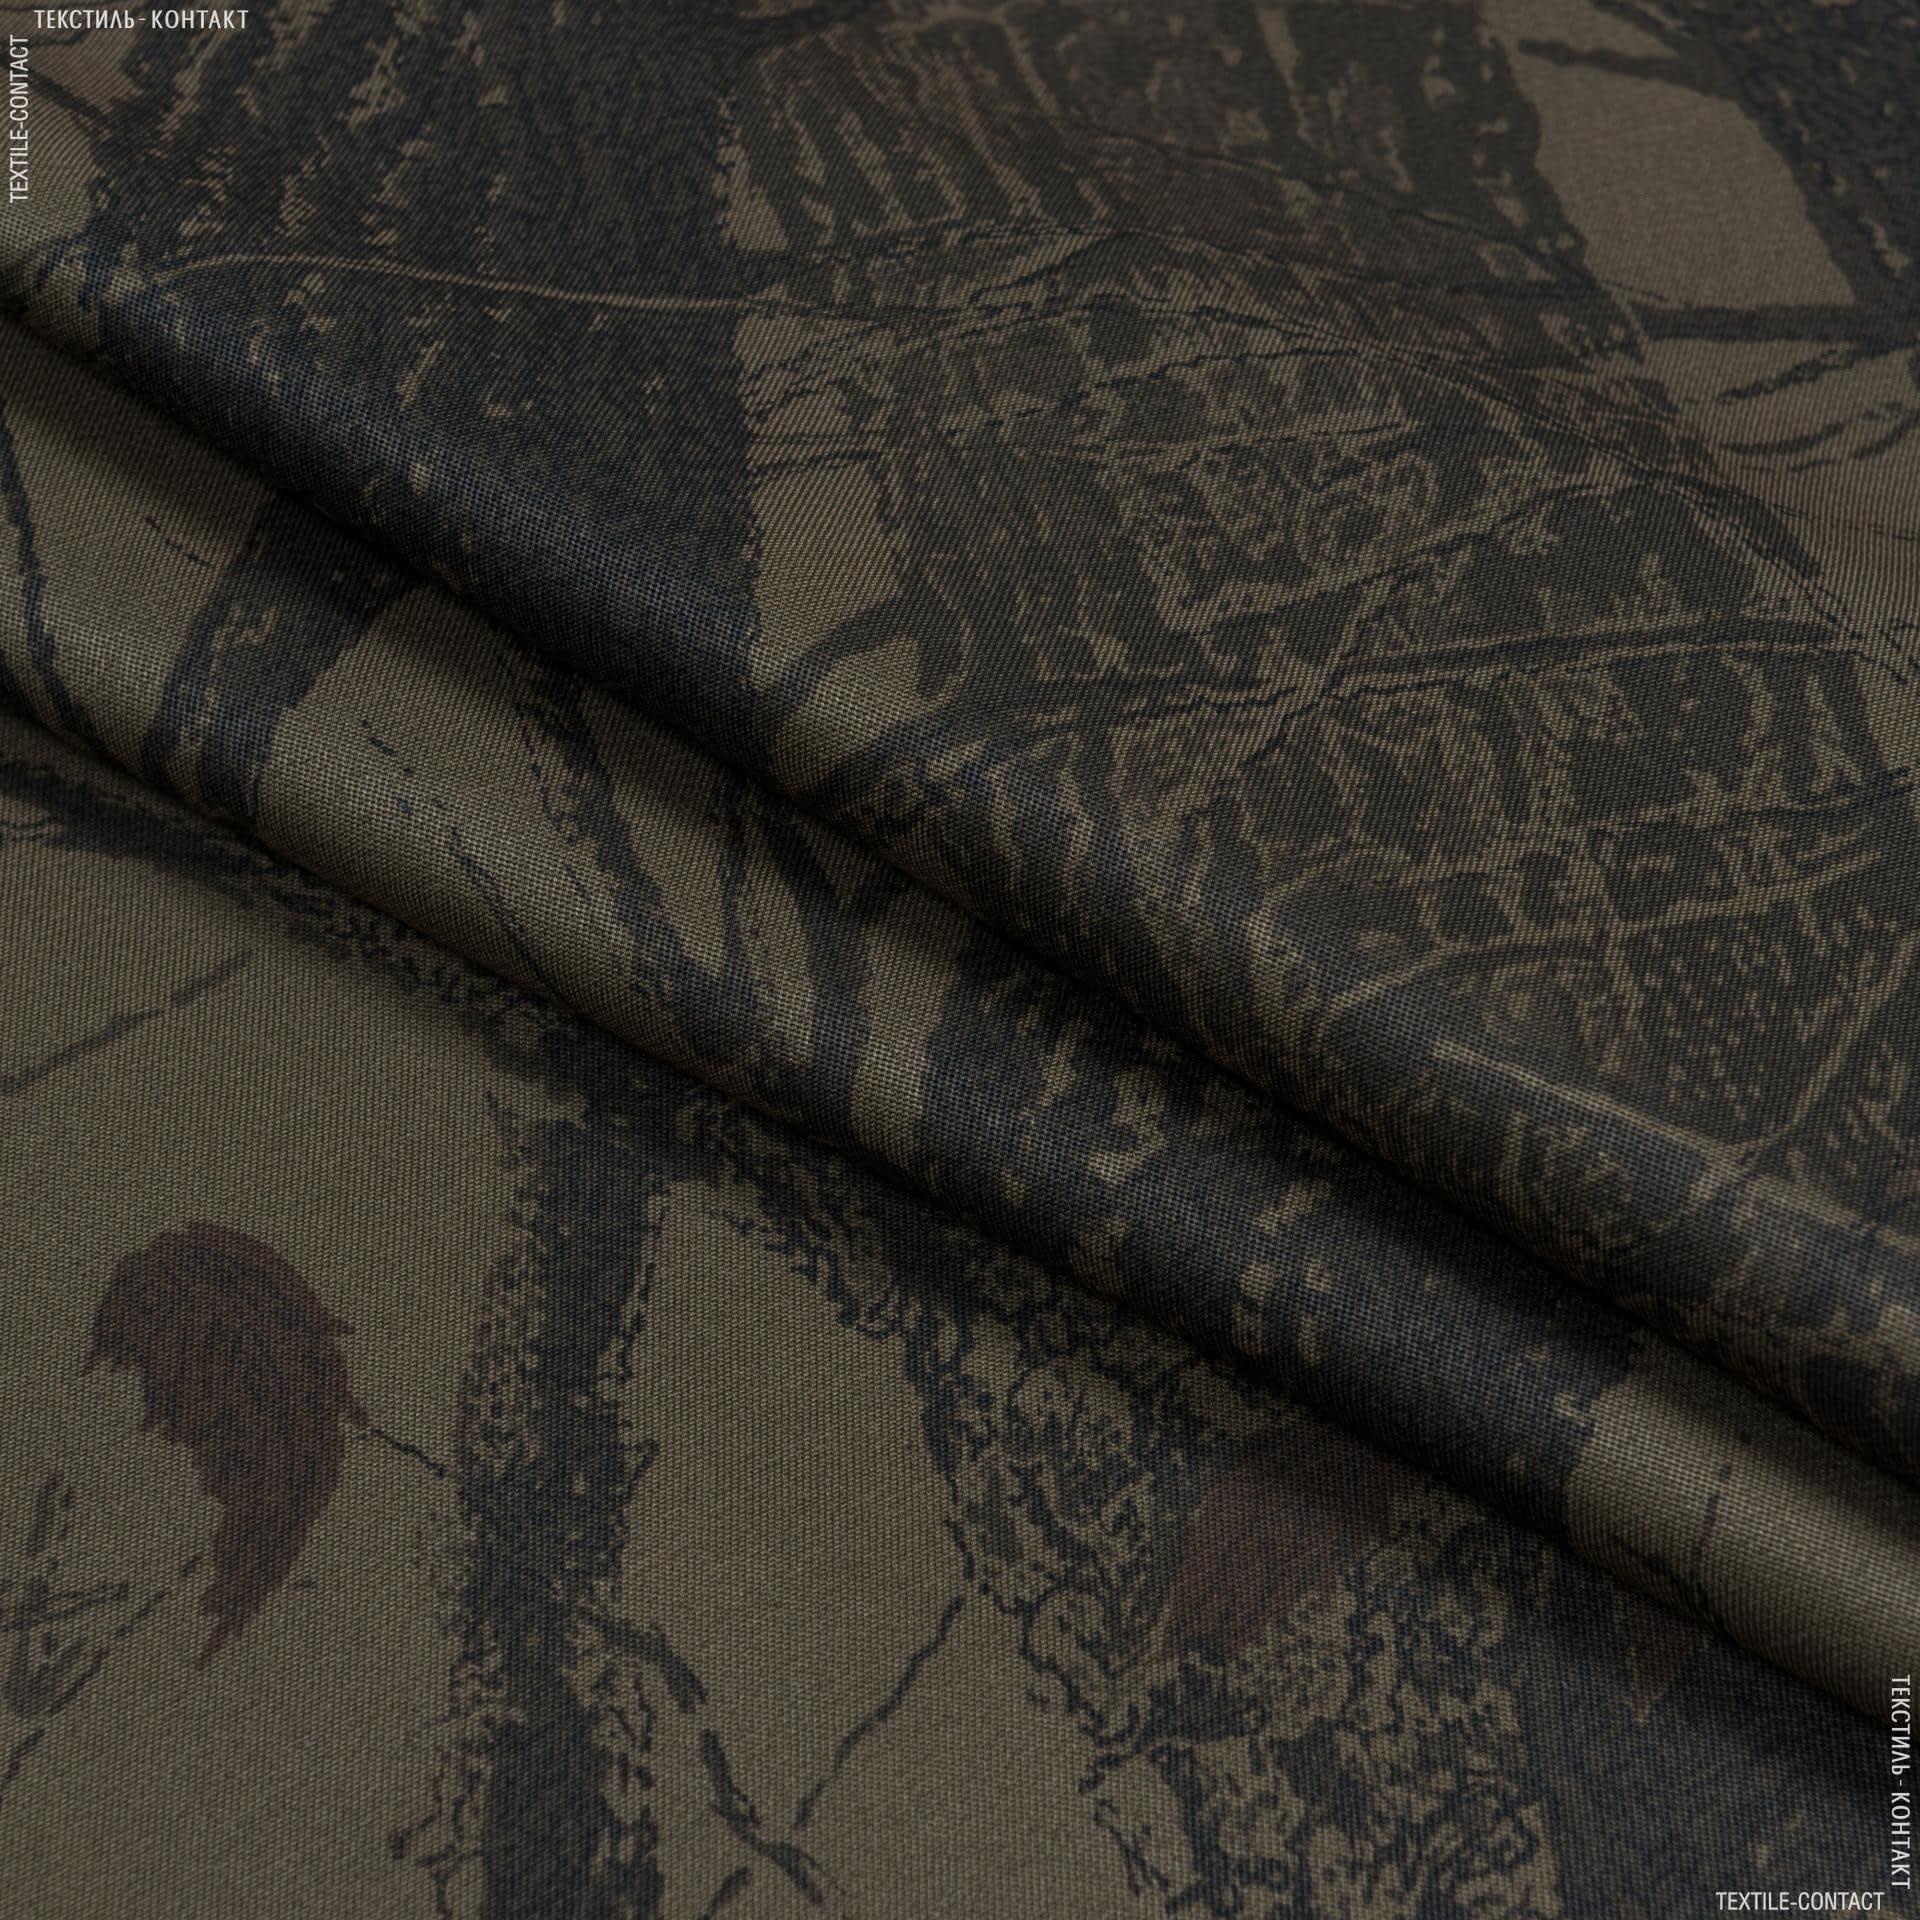 Тканини для спецодягу - Грета 2710 ВСТ камуфльована ліс